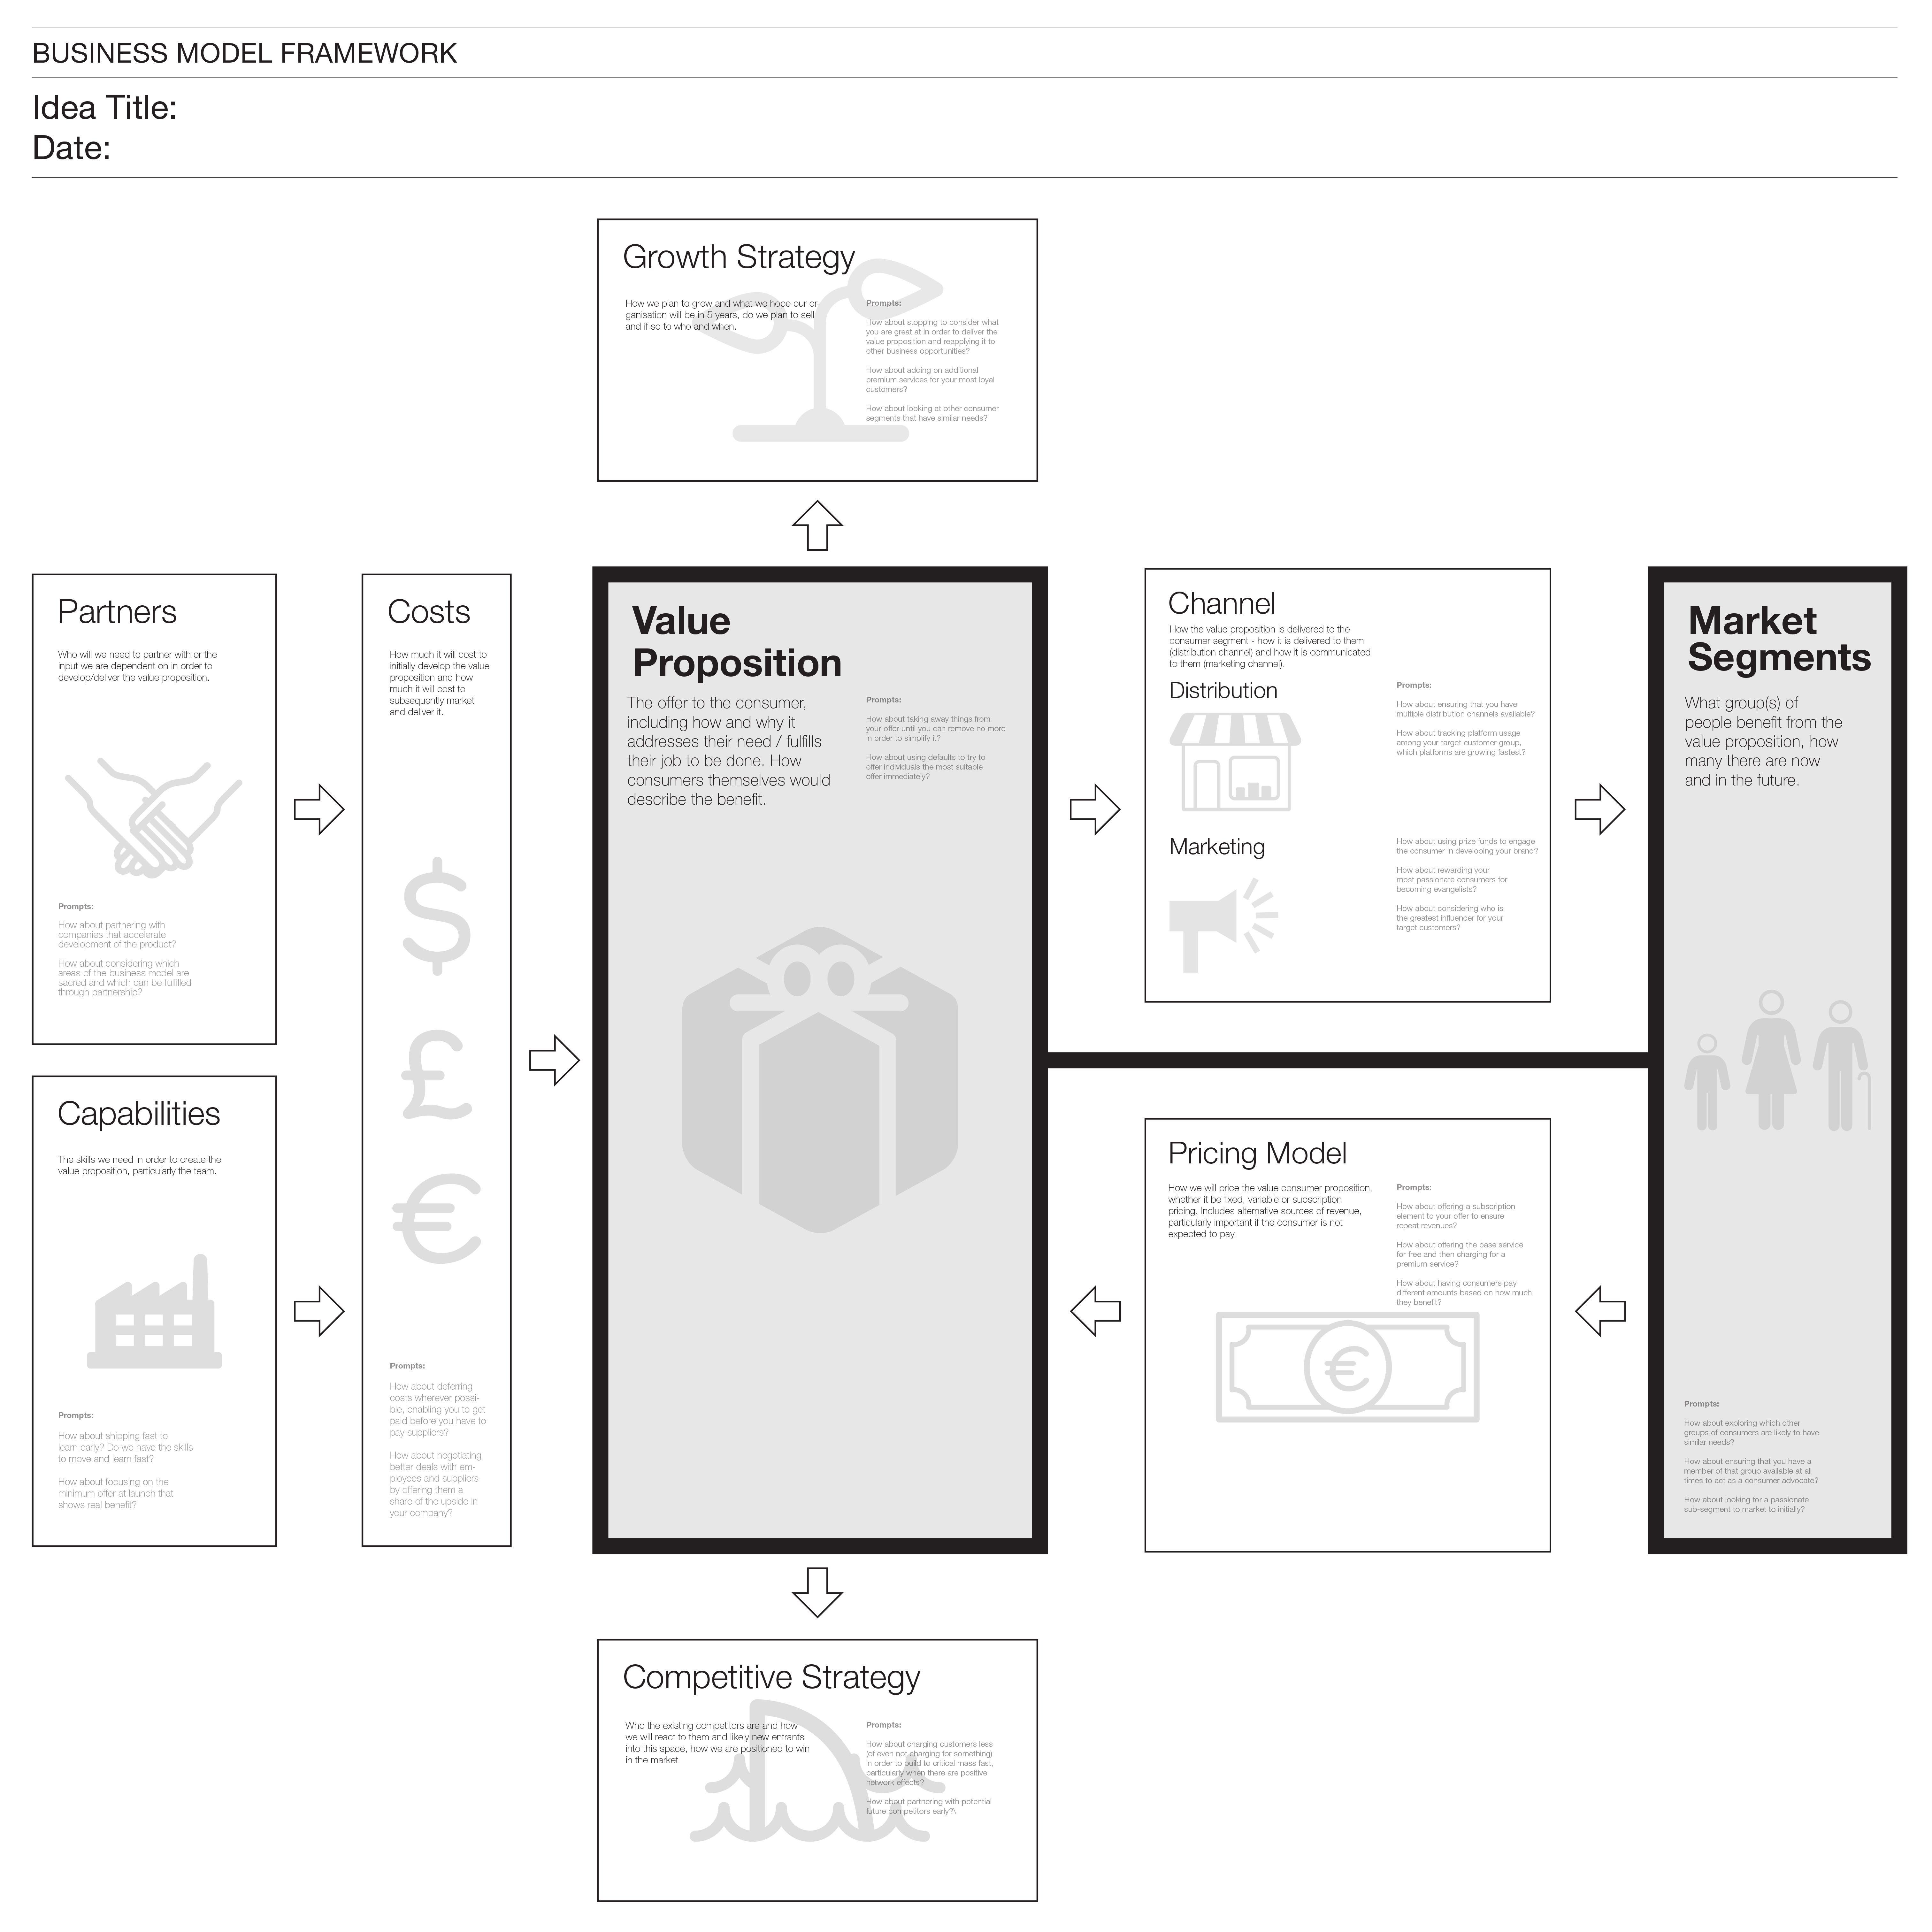 Ideos Business Model Framework Similar To The Business Model Canvas Is Another Business Model Canvas Business Canvas Business Design